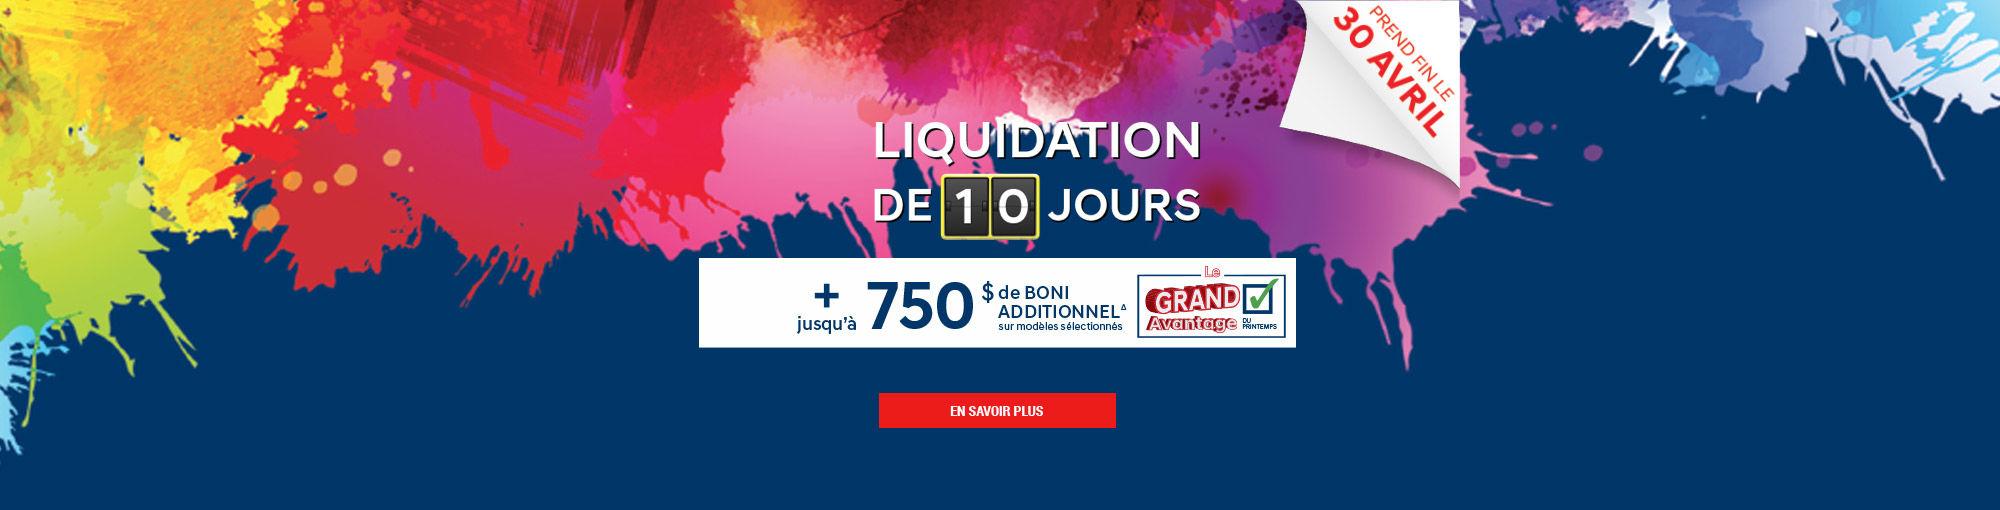 Liquidation 10 jours Printemps 2018 Main Header Avril 2018